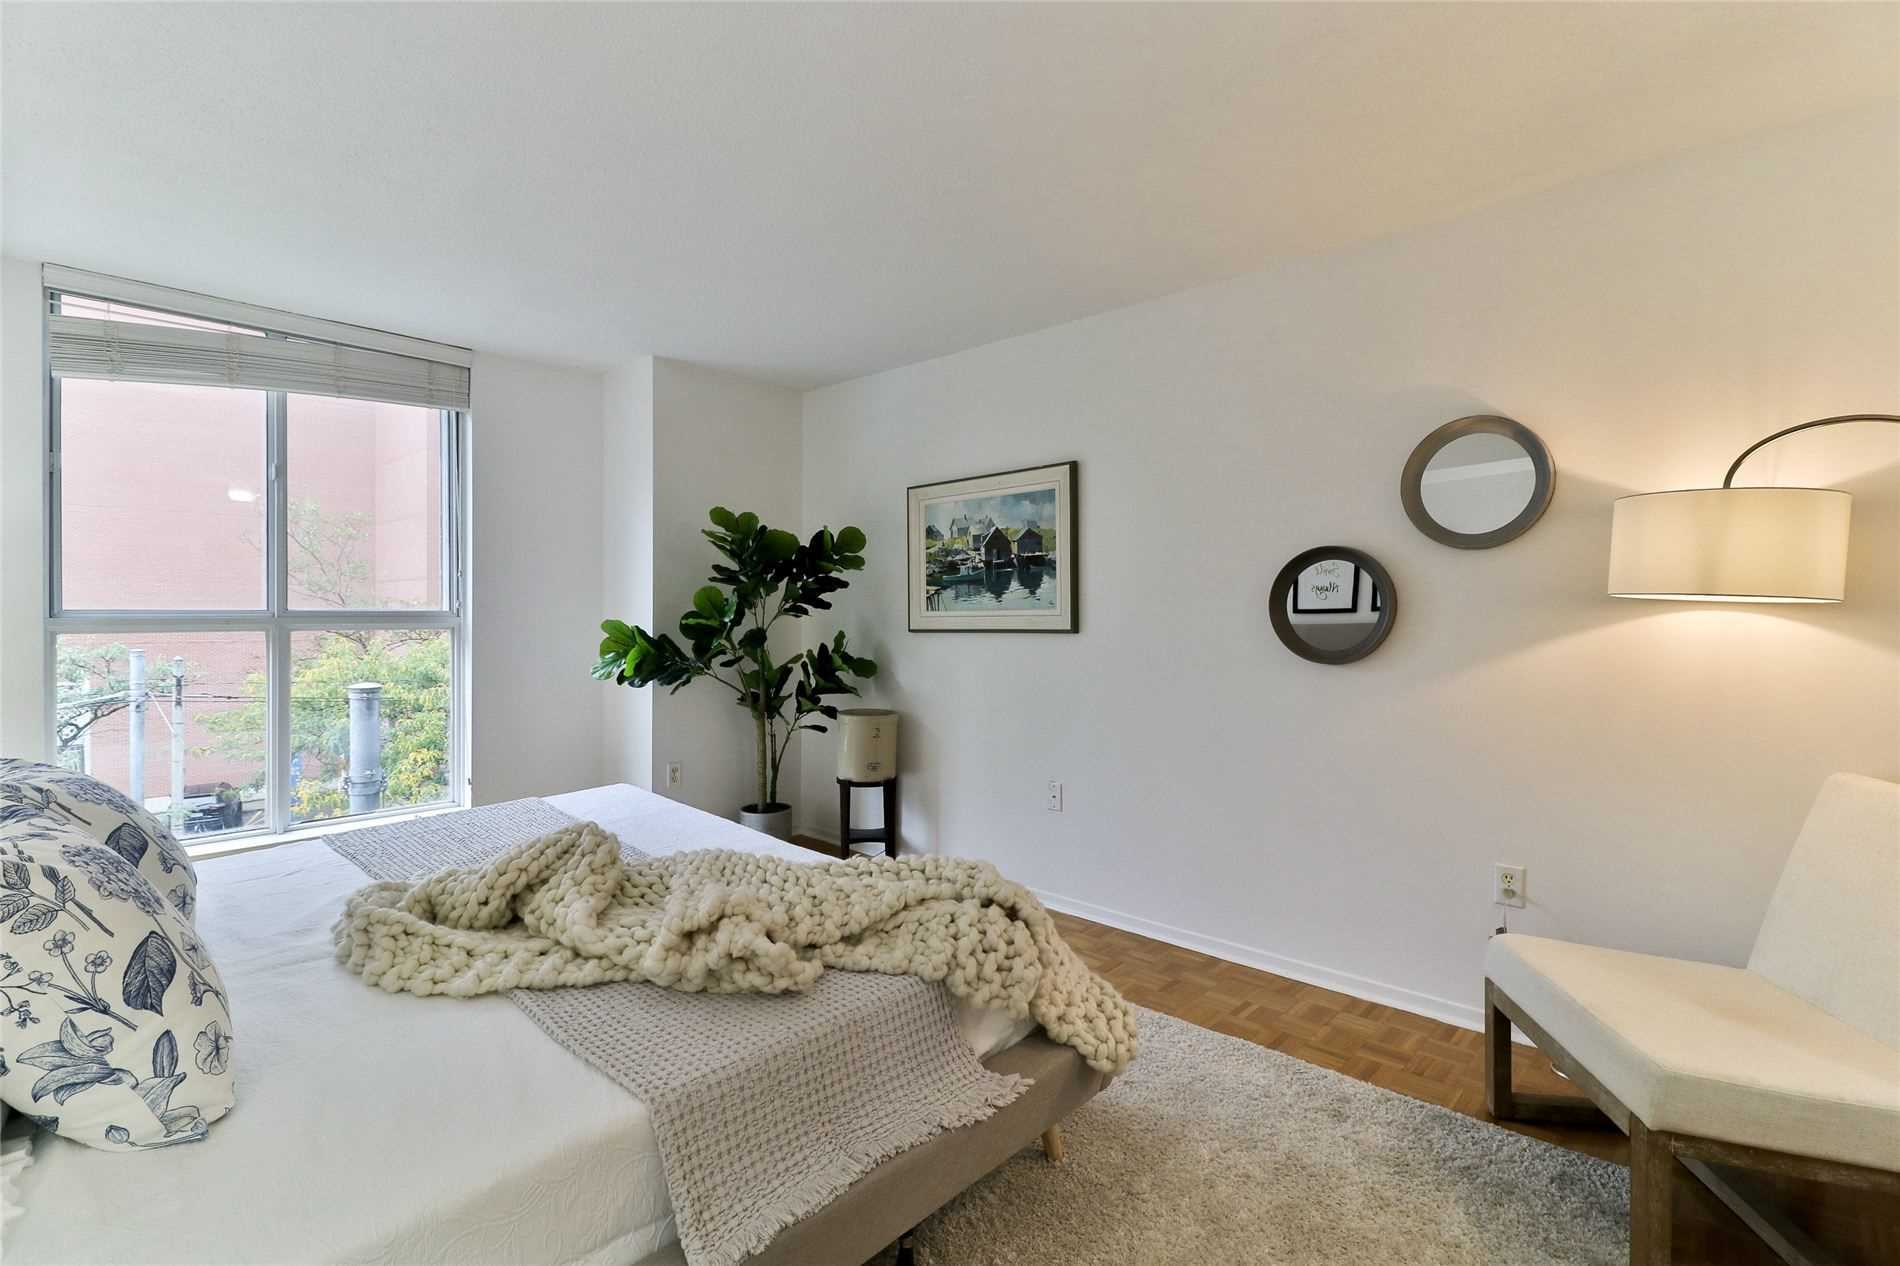 304 - 35 Church St - Church-Yonge Corridor Condo Apt for sale, 1 Bedroom (C5399330) - #22